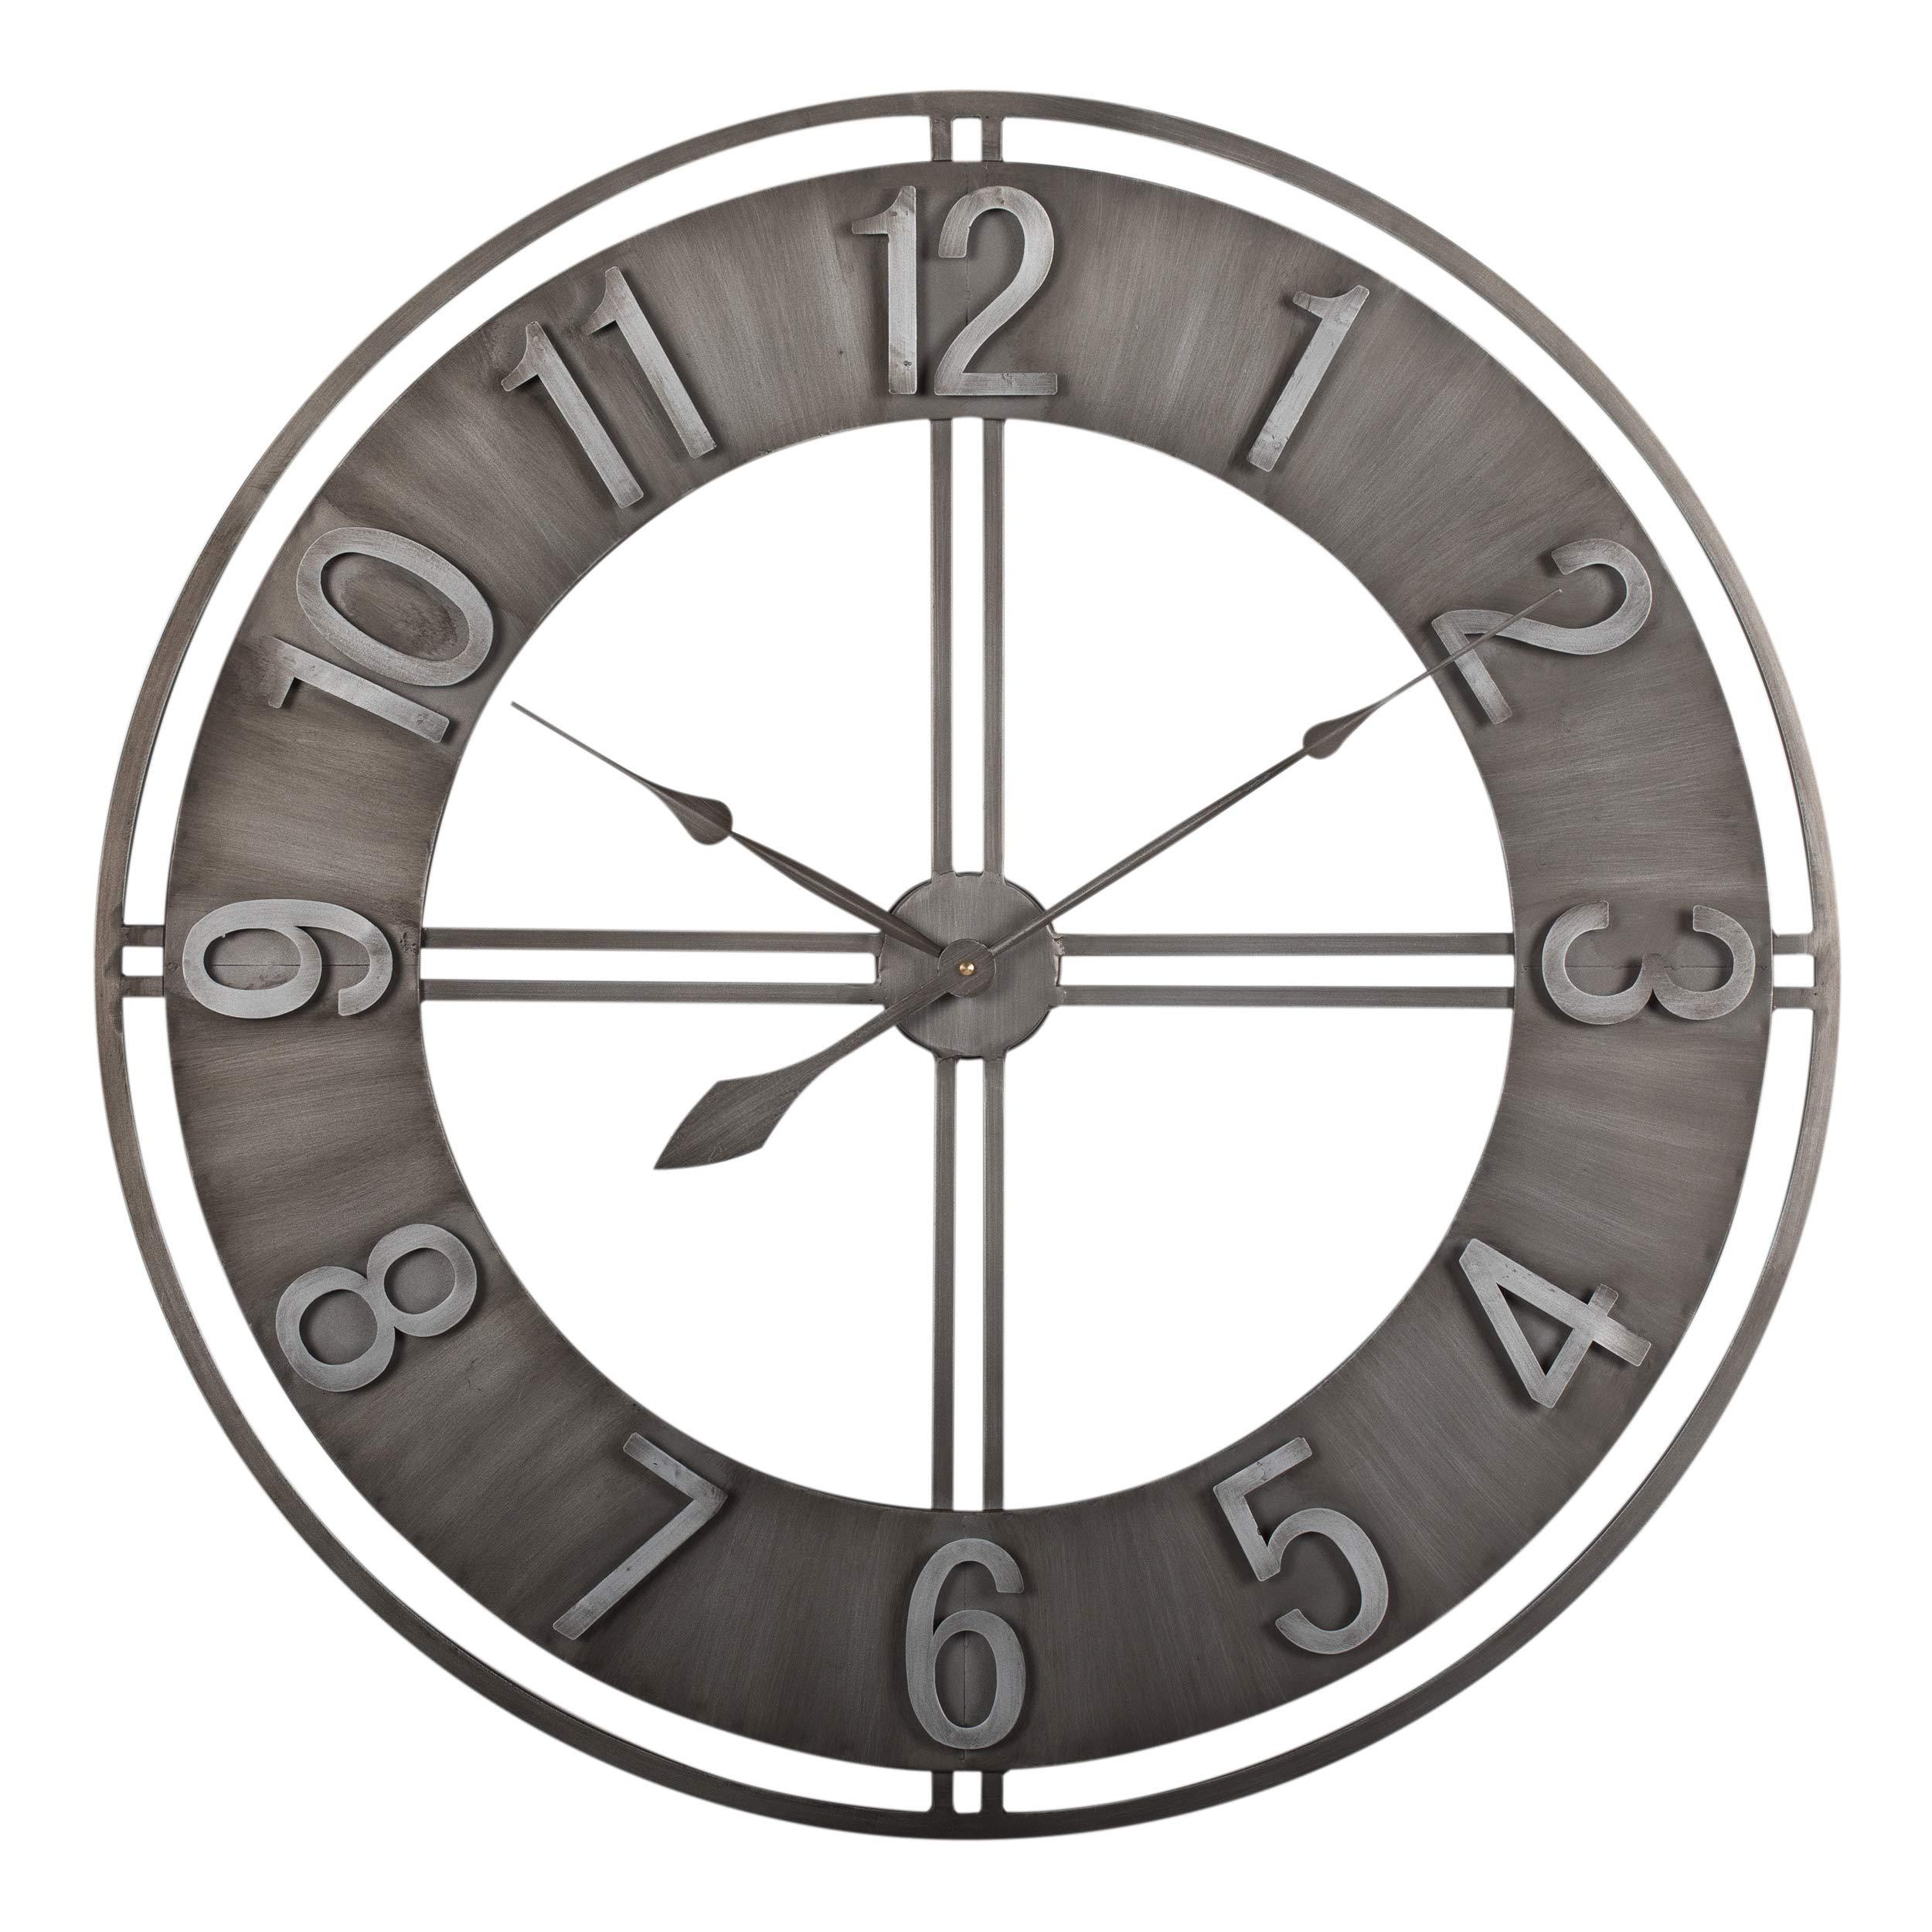 Studio Designs Home 30'' Industrial LOFT Decor Wall Clock, Brushed Metal by Studio Designs Home